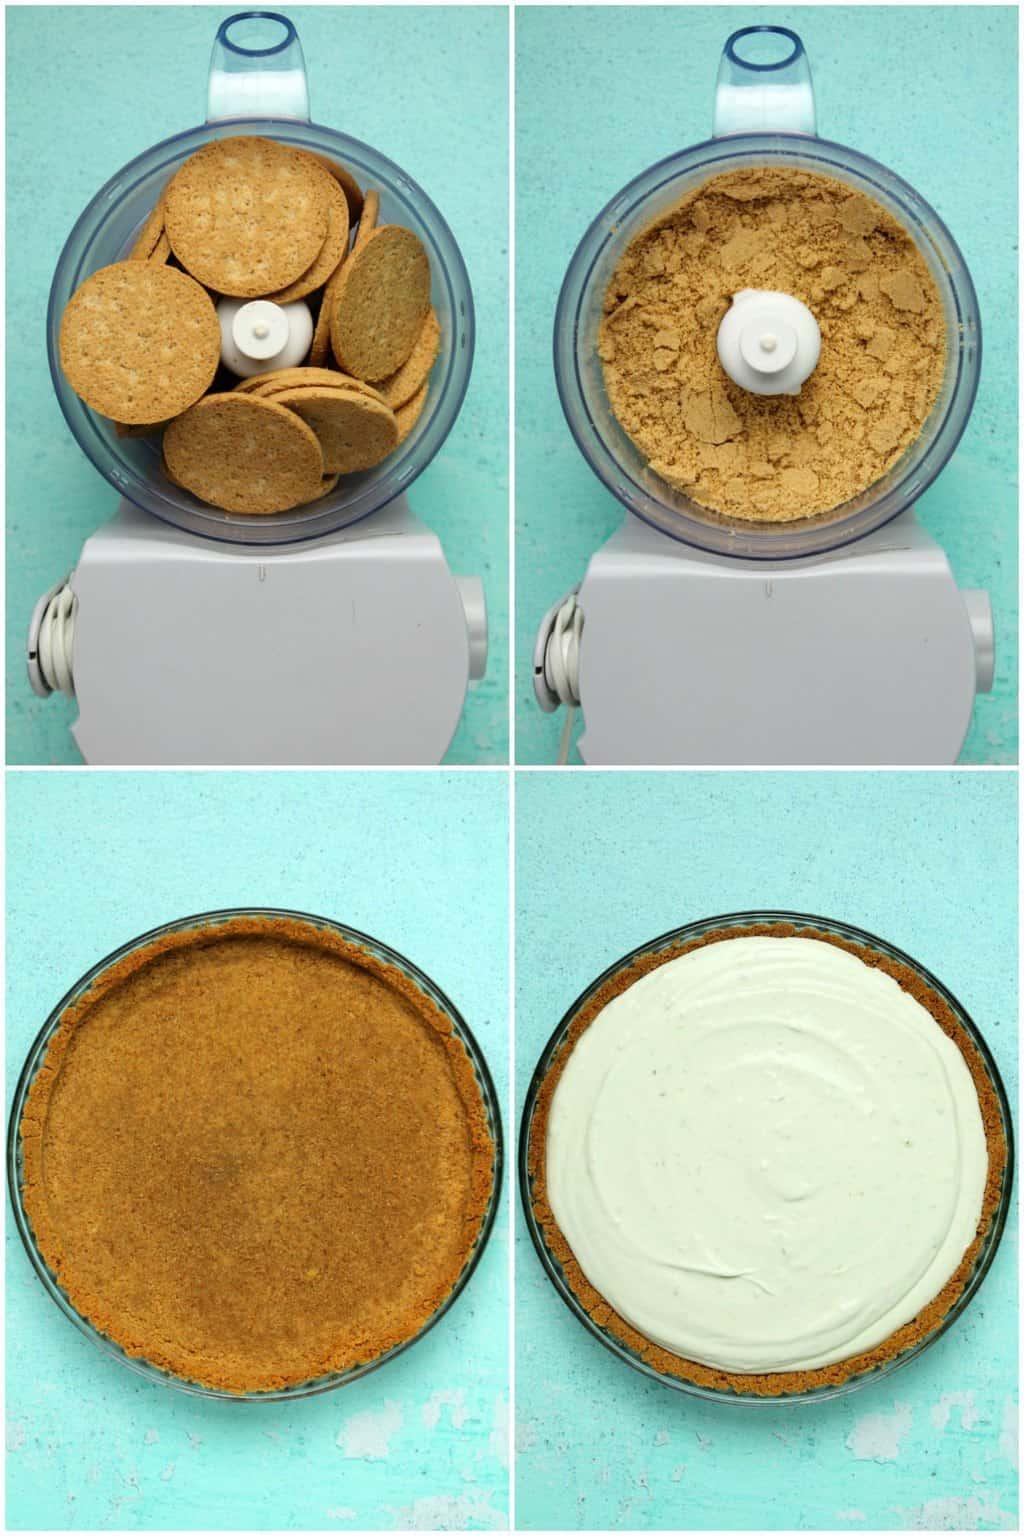 Process photos of making a vegan key lime pie.